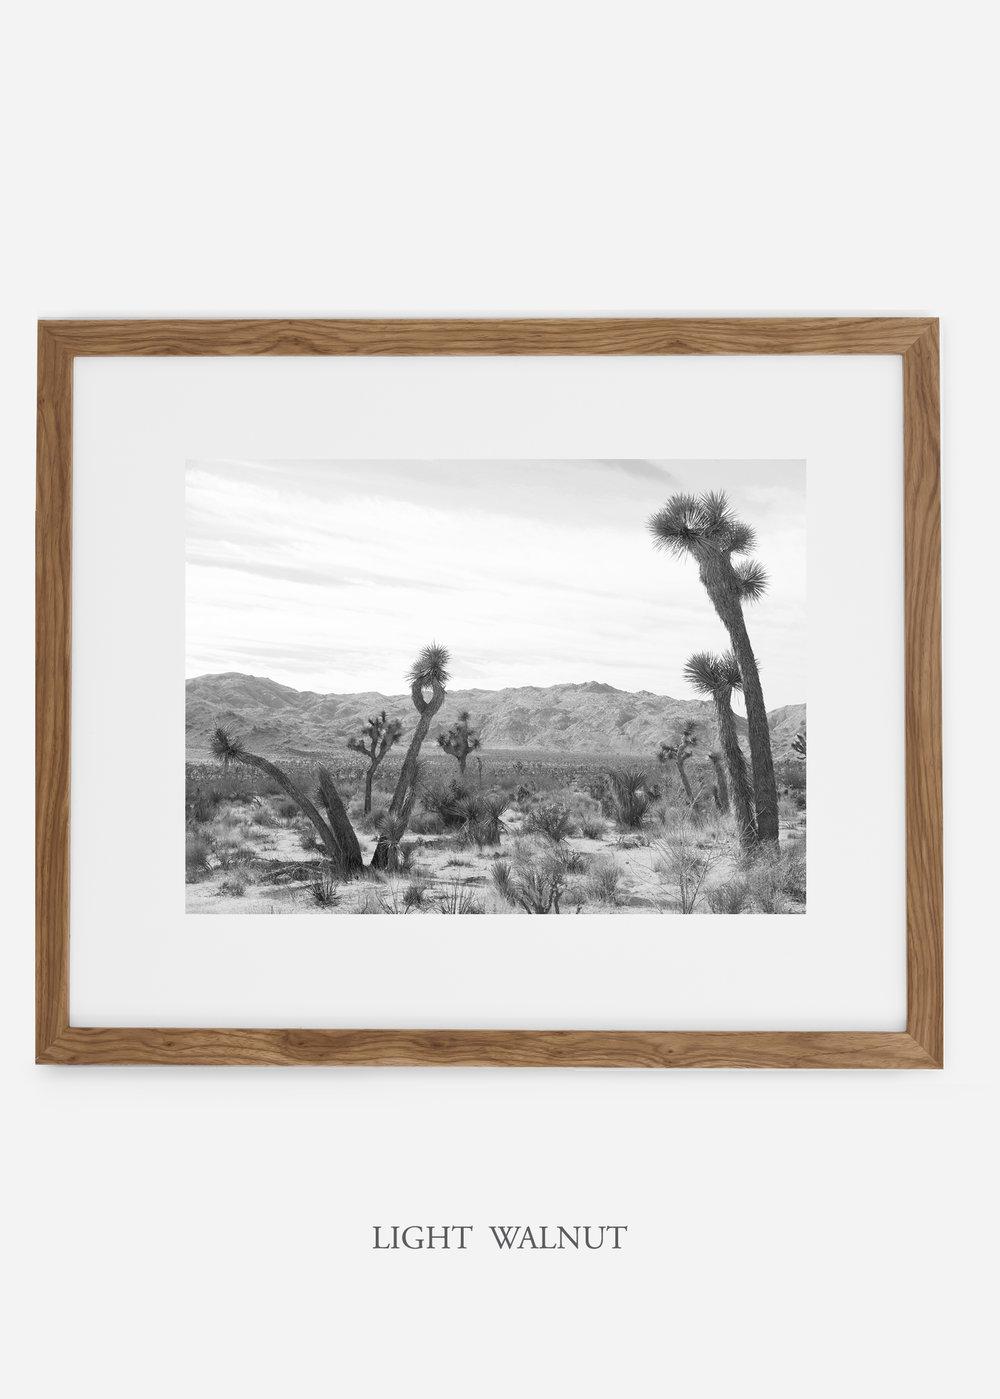 WilderCalifornia_lightwalnutframe_JoshuaTree_No.4_interiordesign_cactusprint_art.jpg